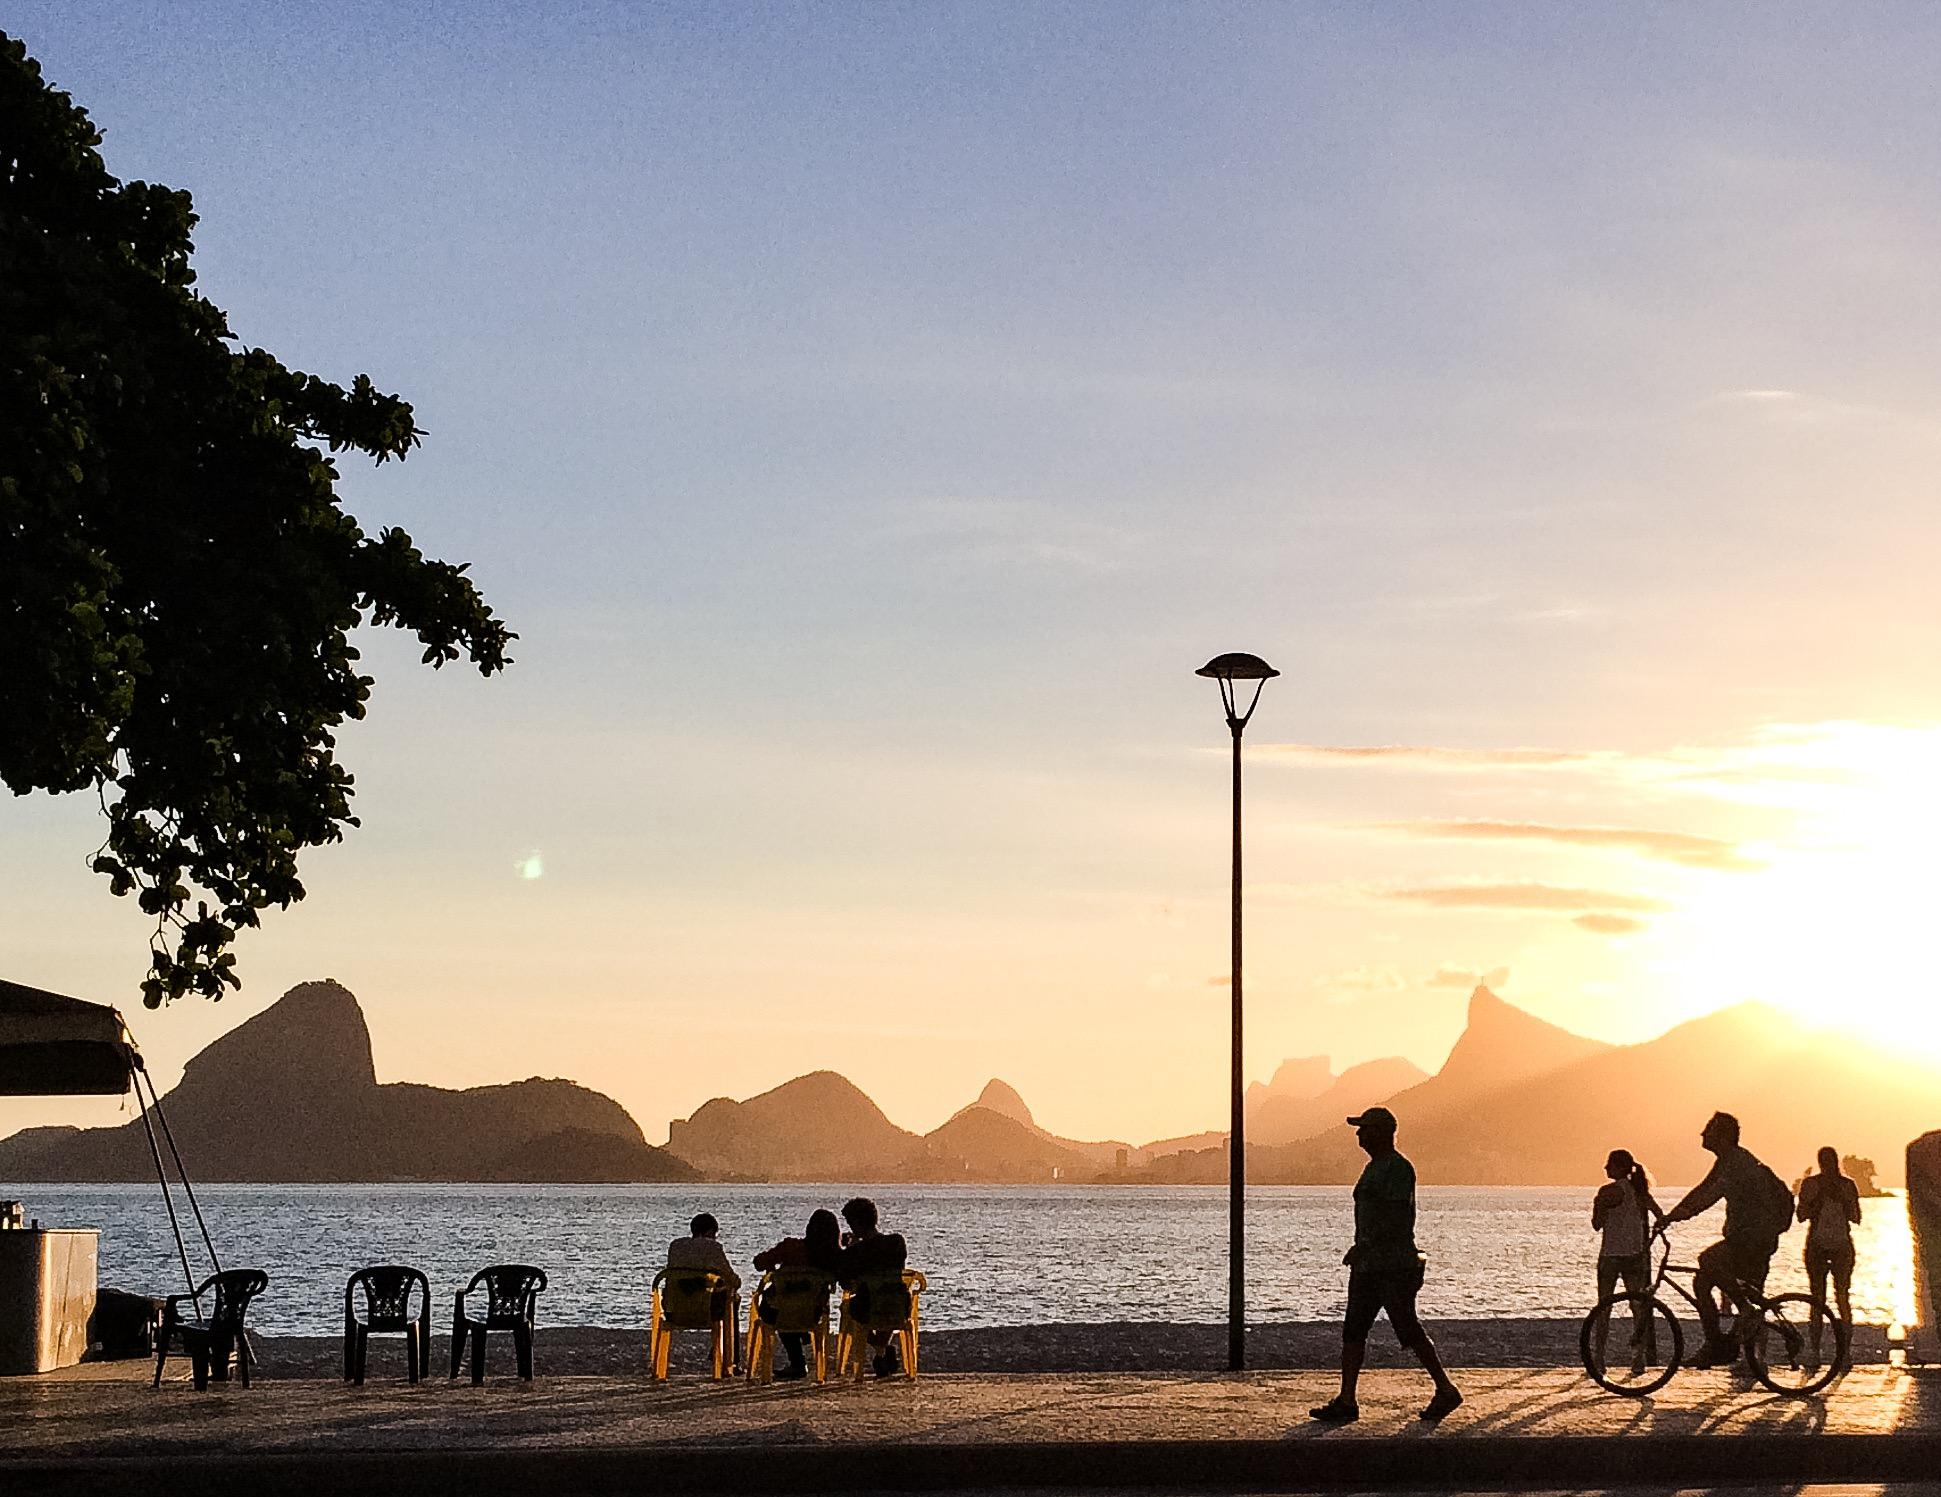 6 on 6 - Lugares que Gostamos - Niterói, Praia de Icaraí